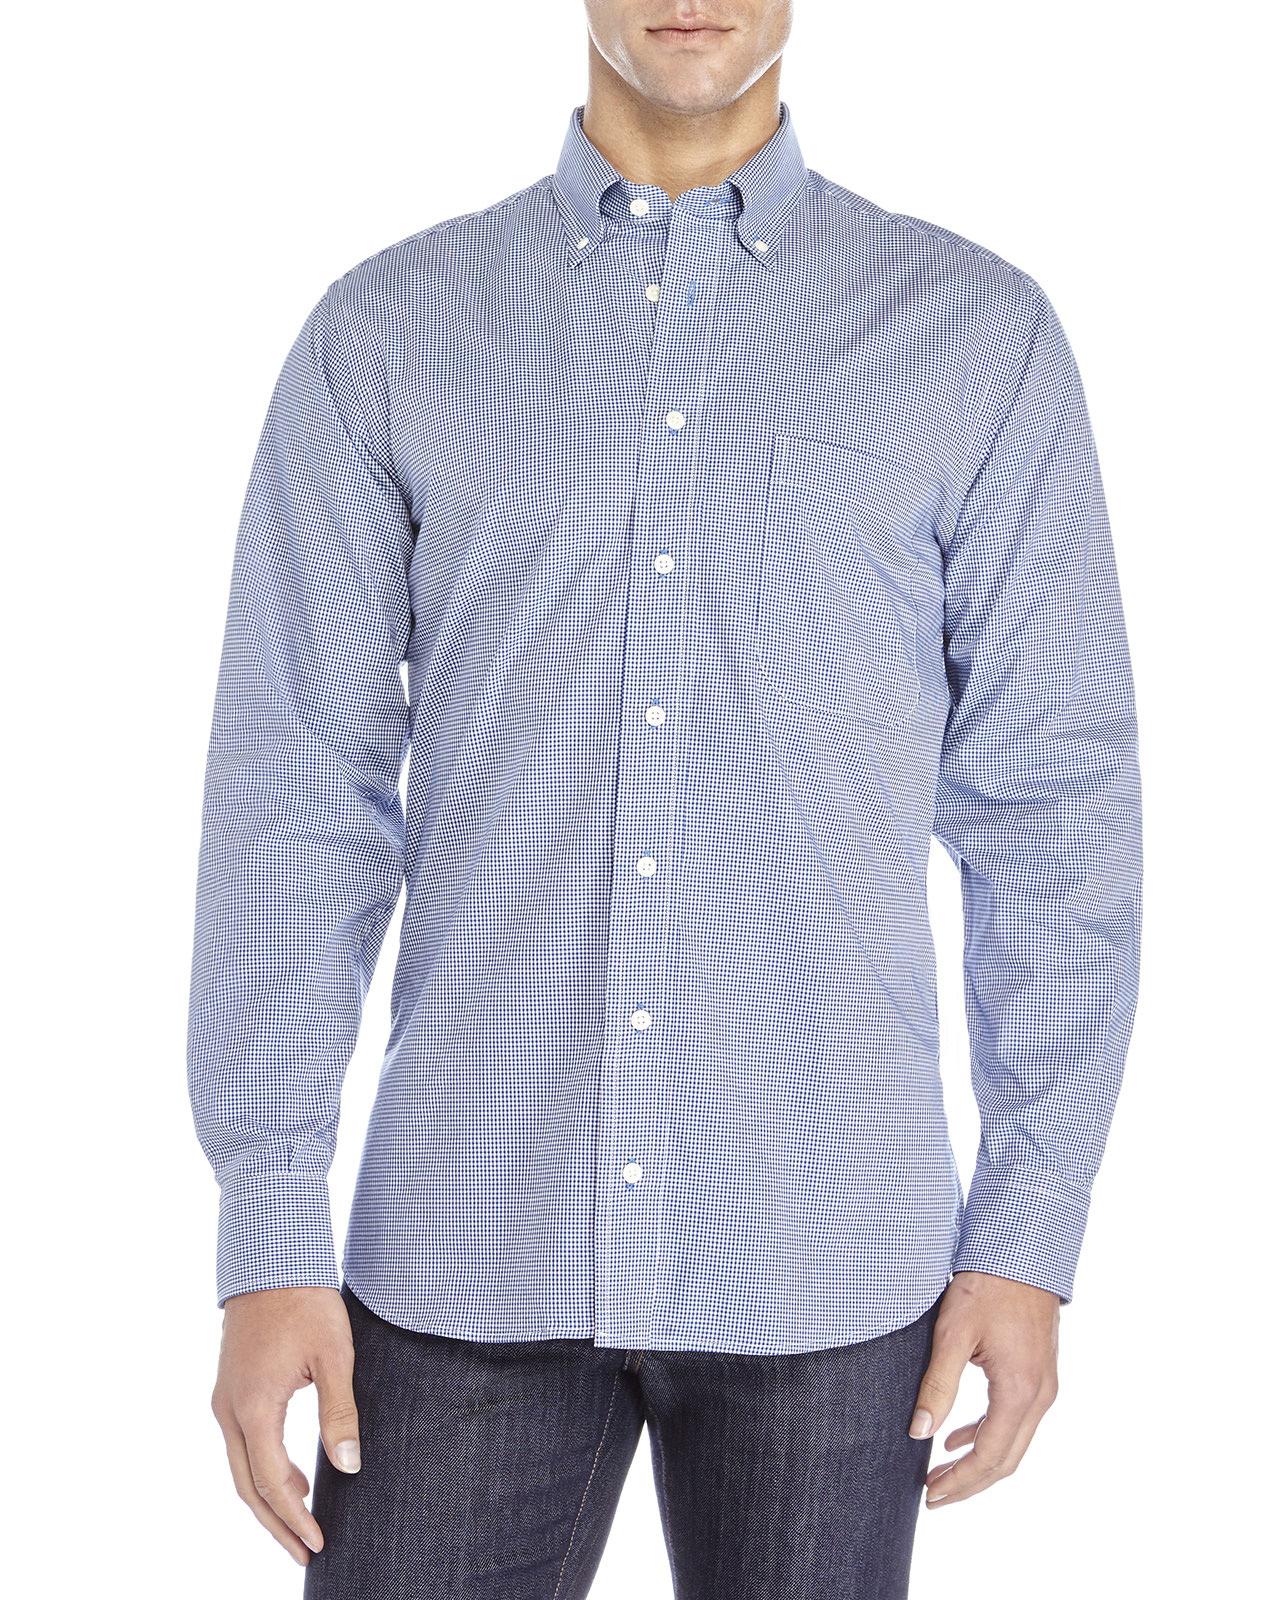 Gitman bros mini gingham button down shirt in blue for men for Blue gingham button down shirt